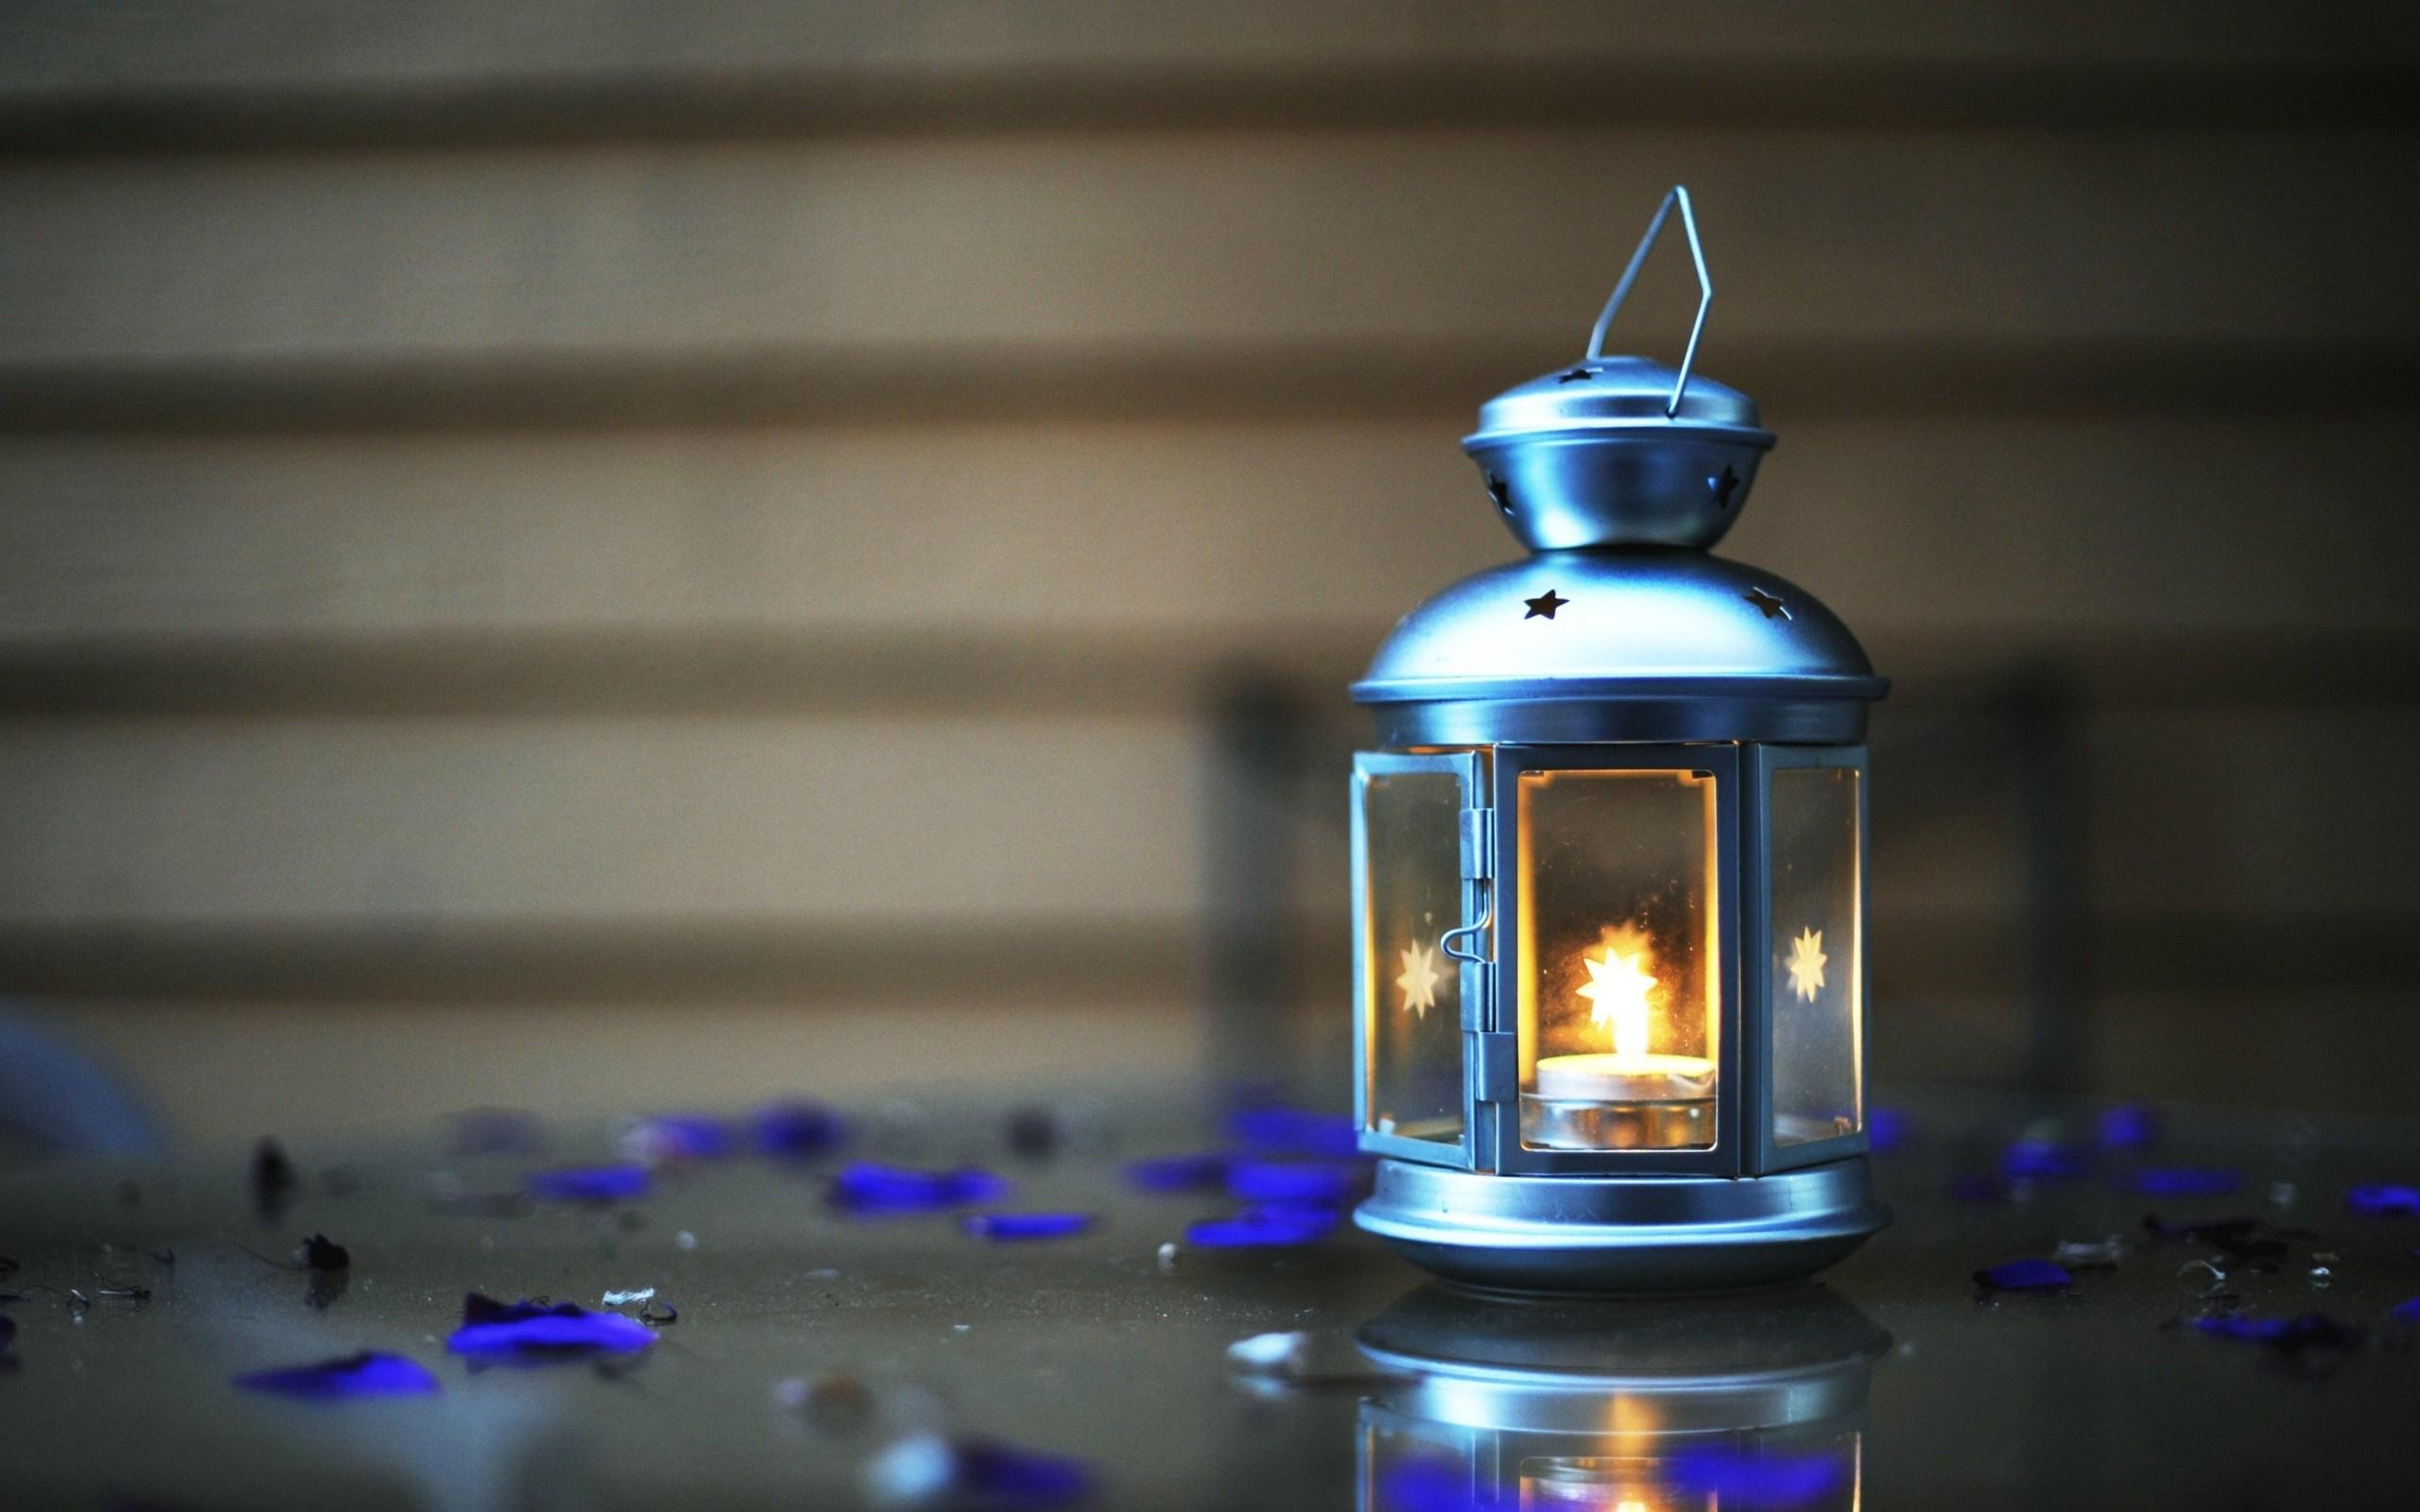 24 wonderful hd lamp wallpapers - Night light hd wallpaper ...